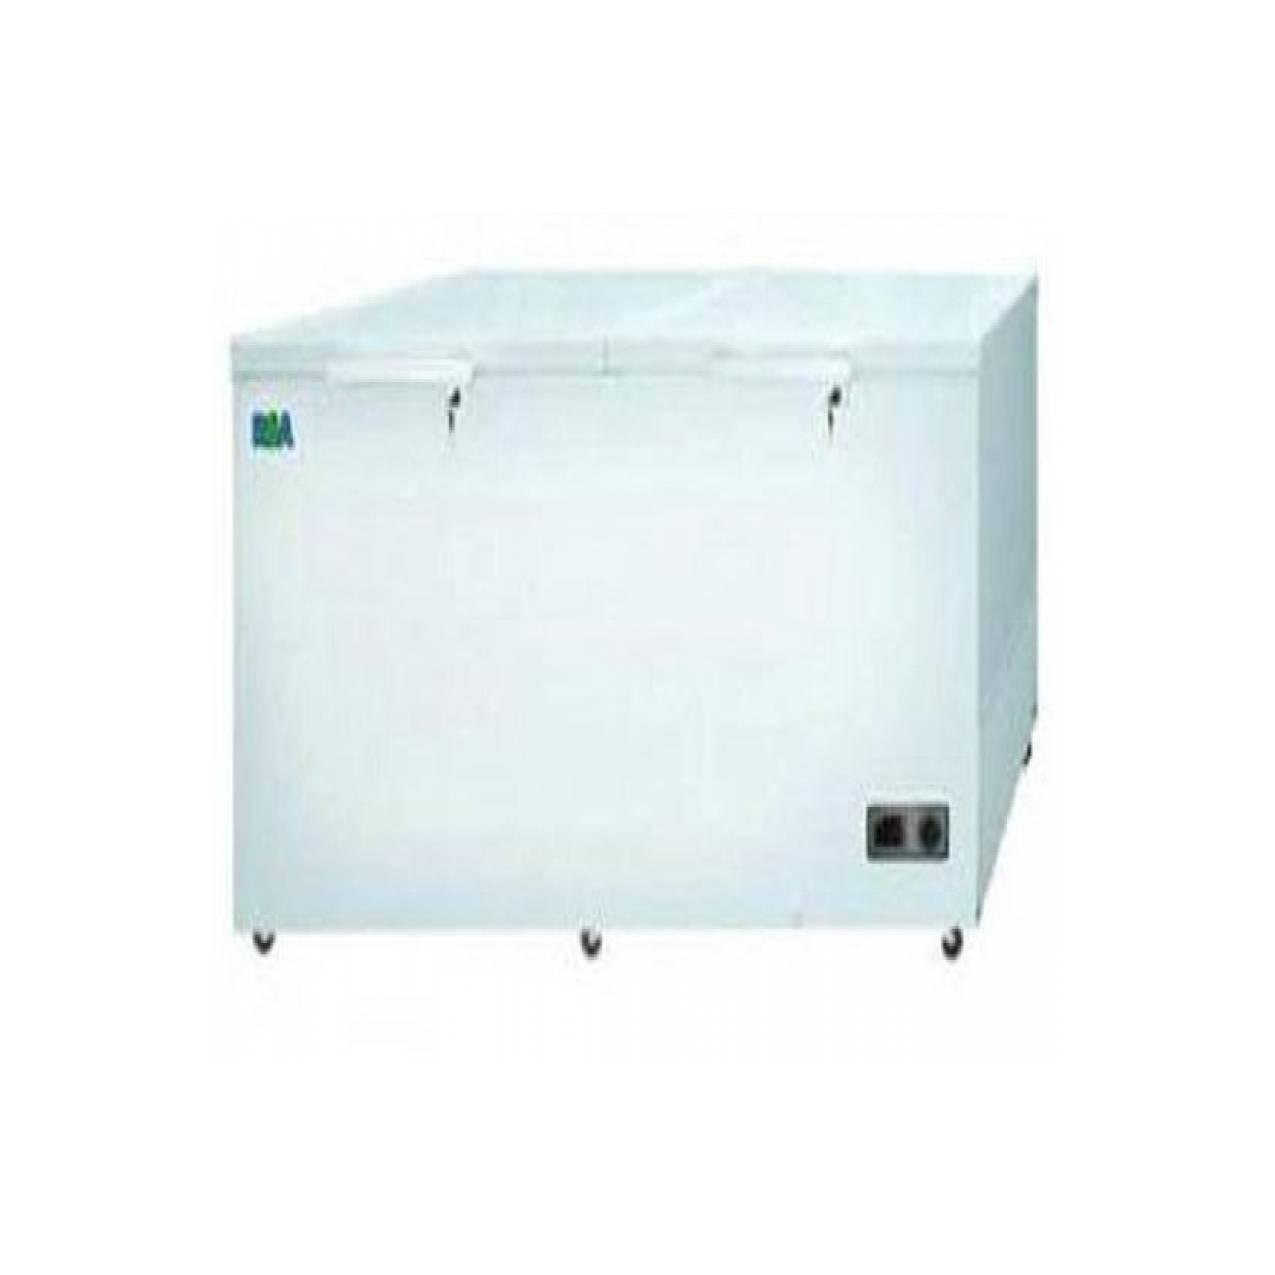 Rsa Cf-600 Chest Freezer Box 600 Liter -26'C